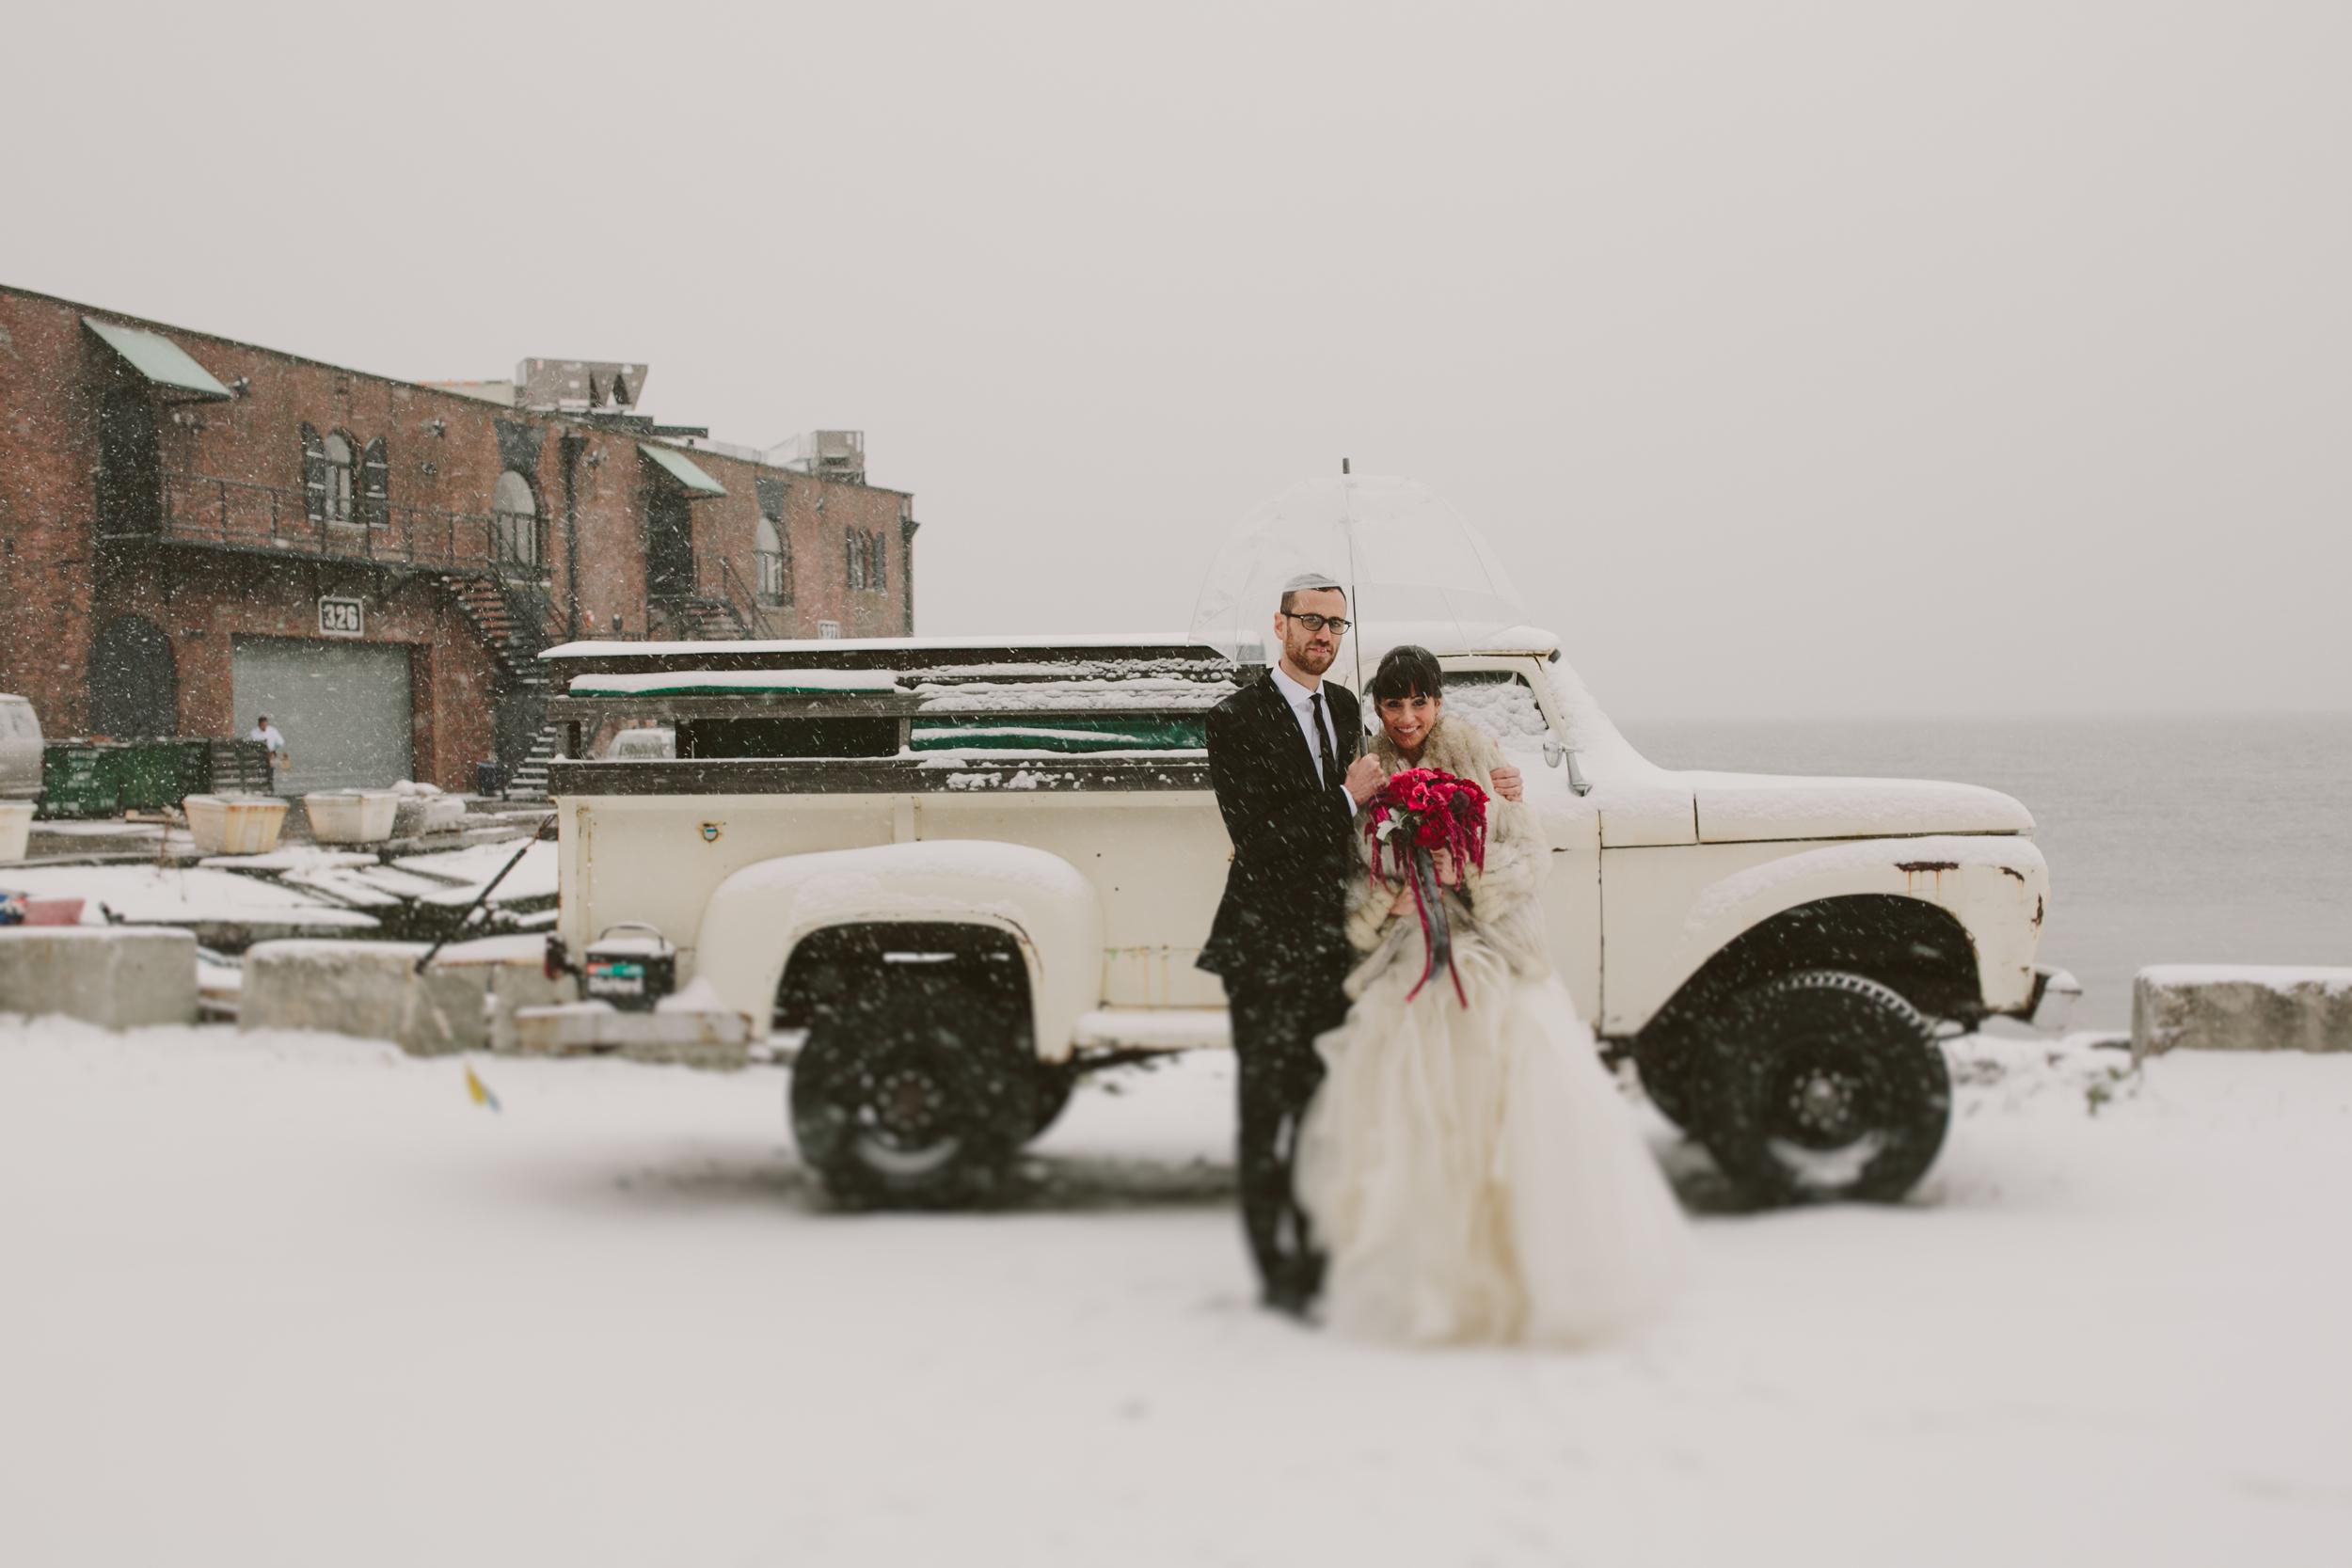 snow_winter_wedding_nyc_chellisemichaelphotography-1000.jpg